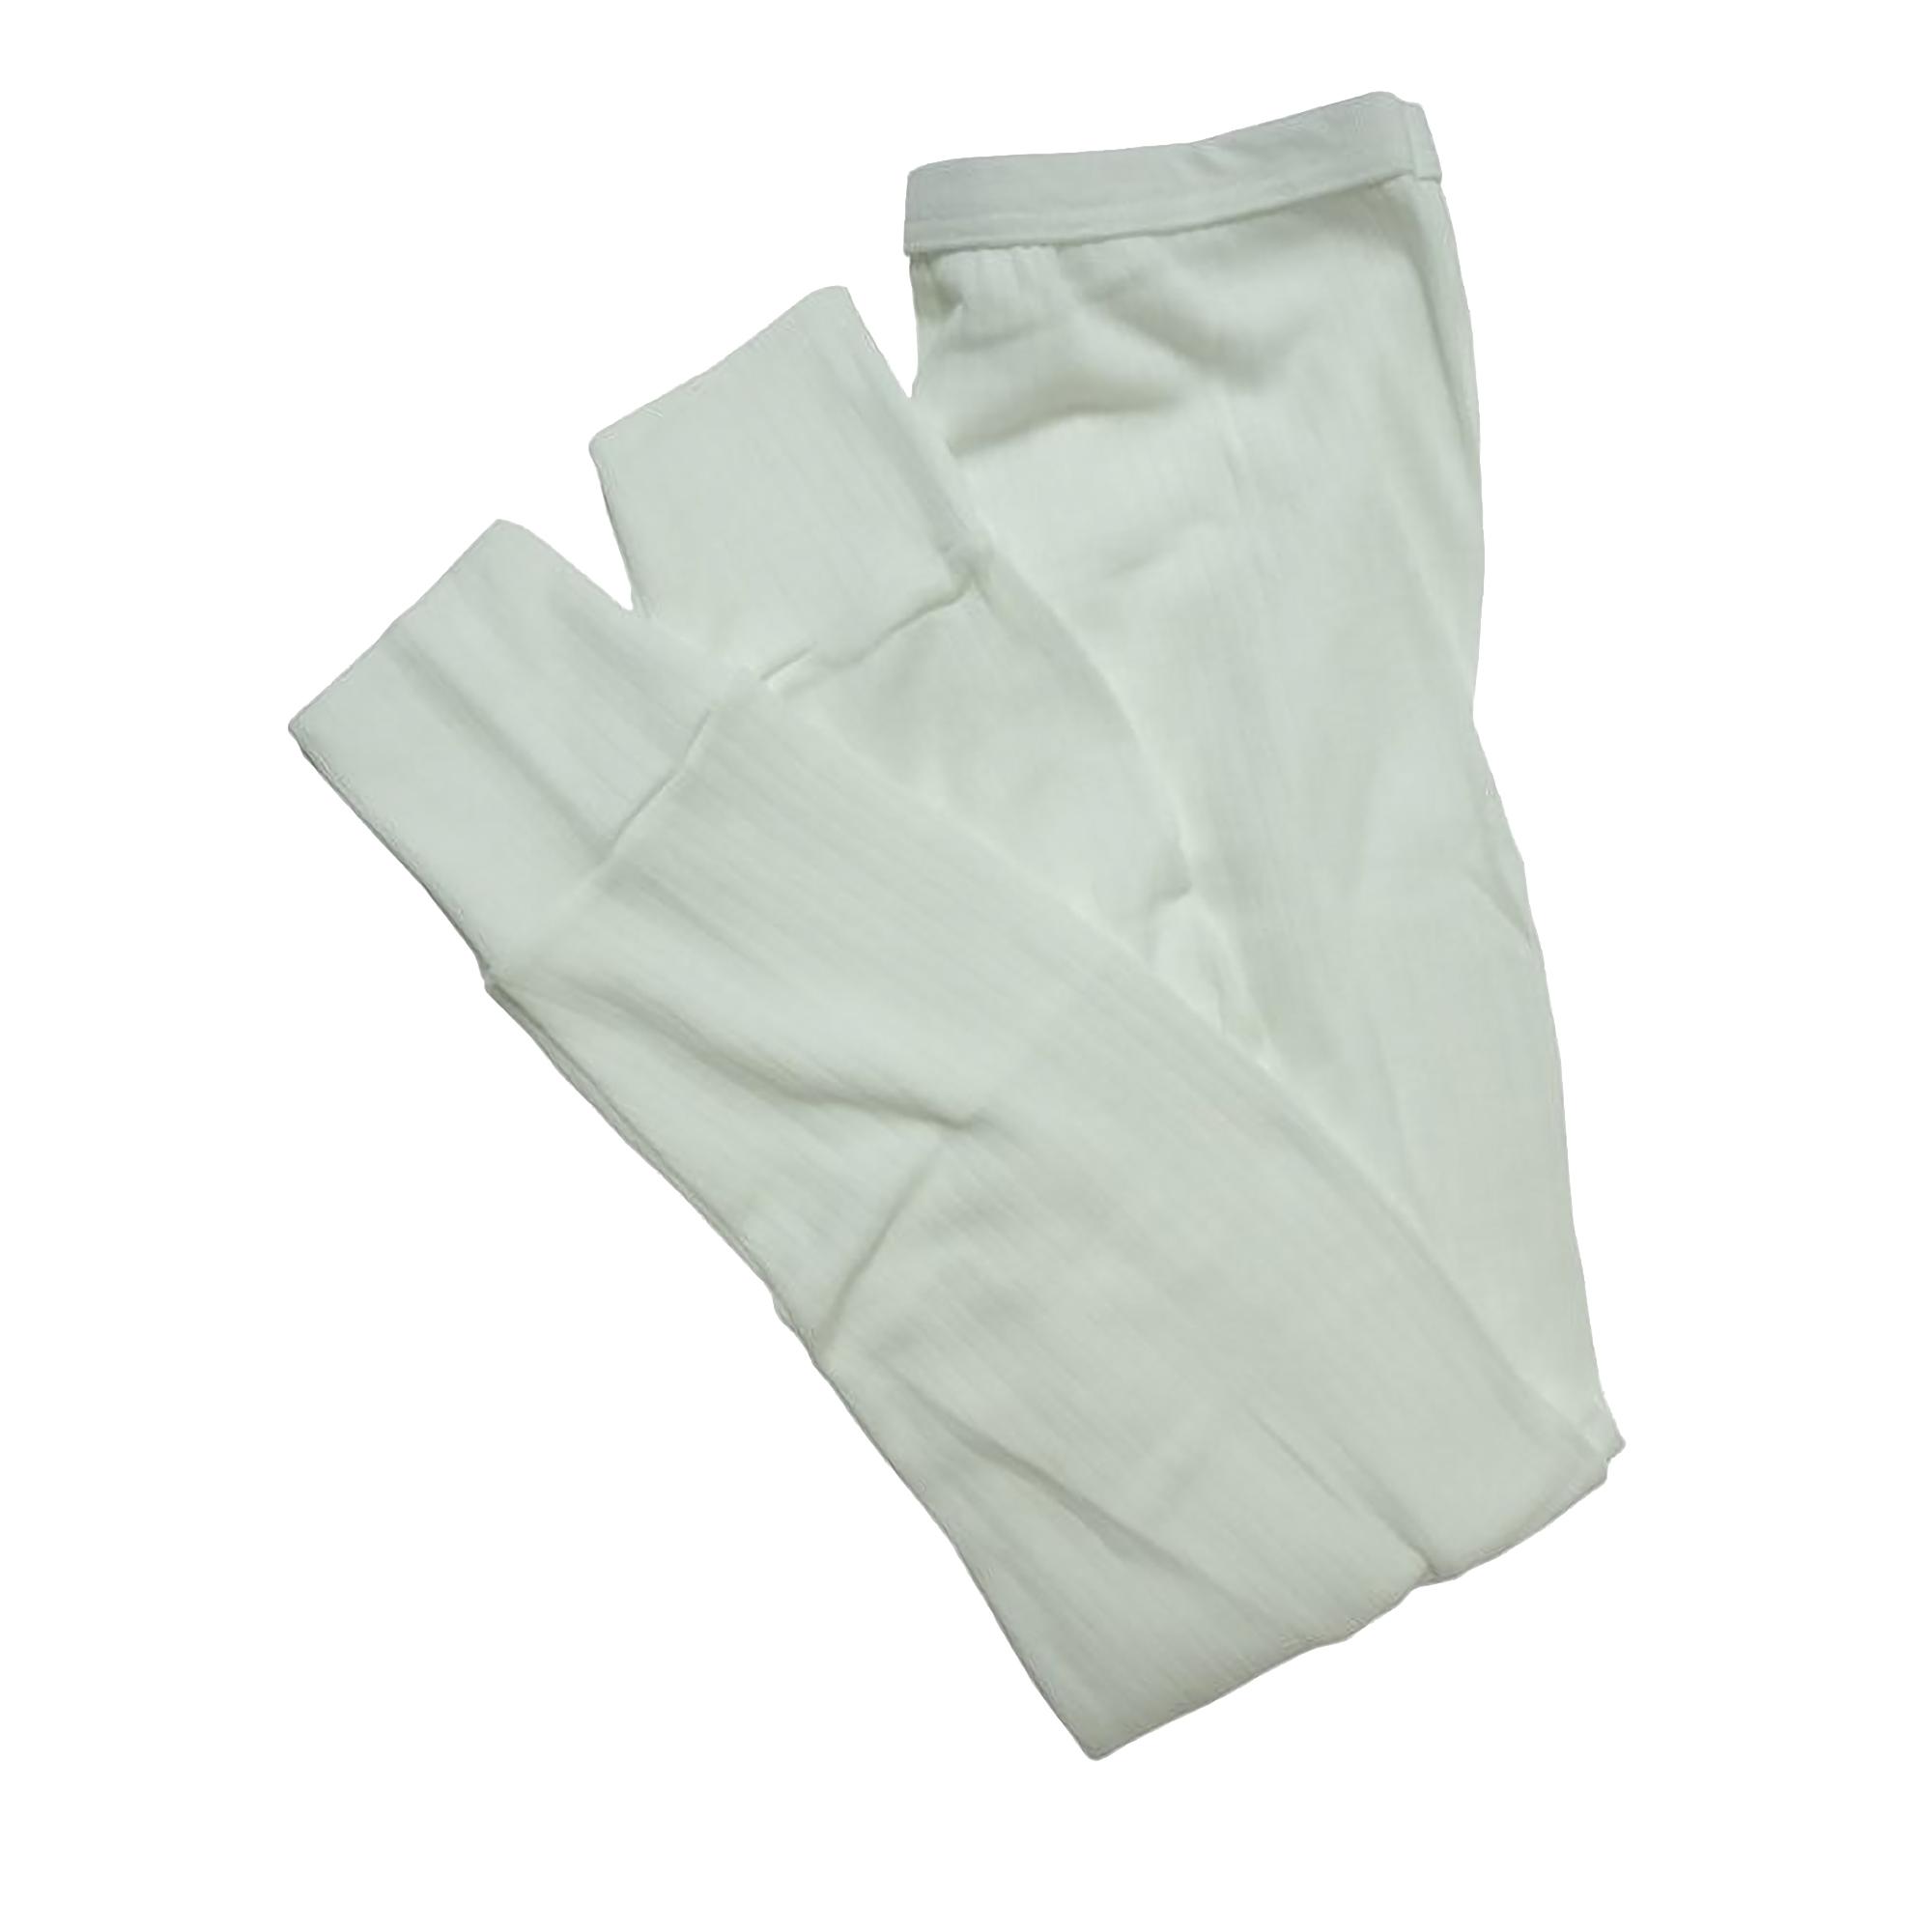 Girls Thermal Underwear Long Johns Pants | eBay